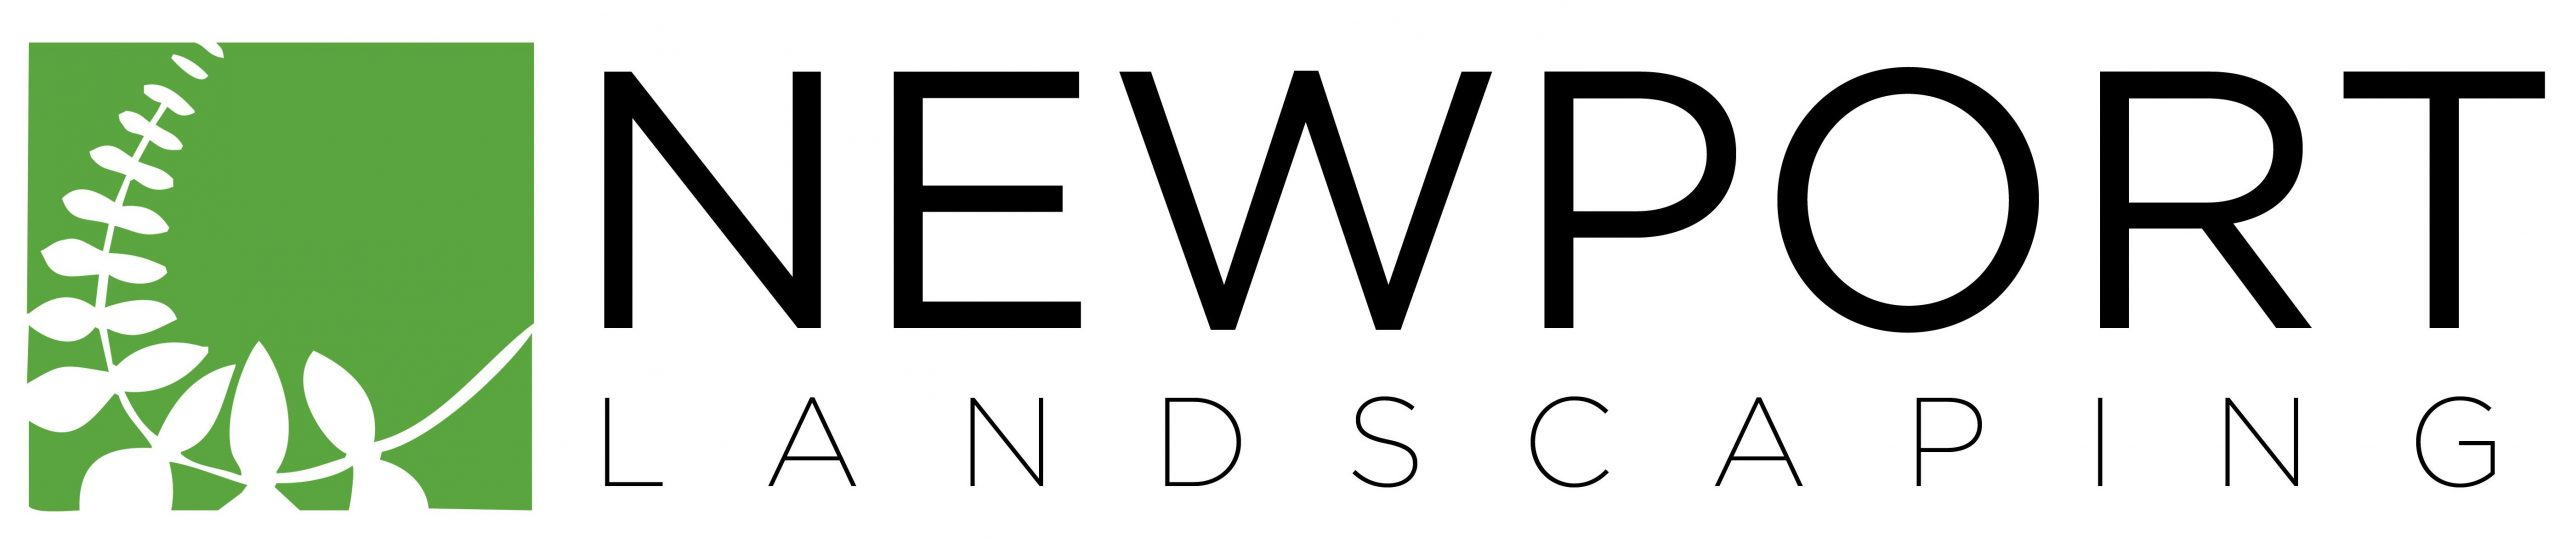 Newport Landscaping & Design